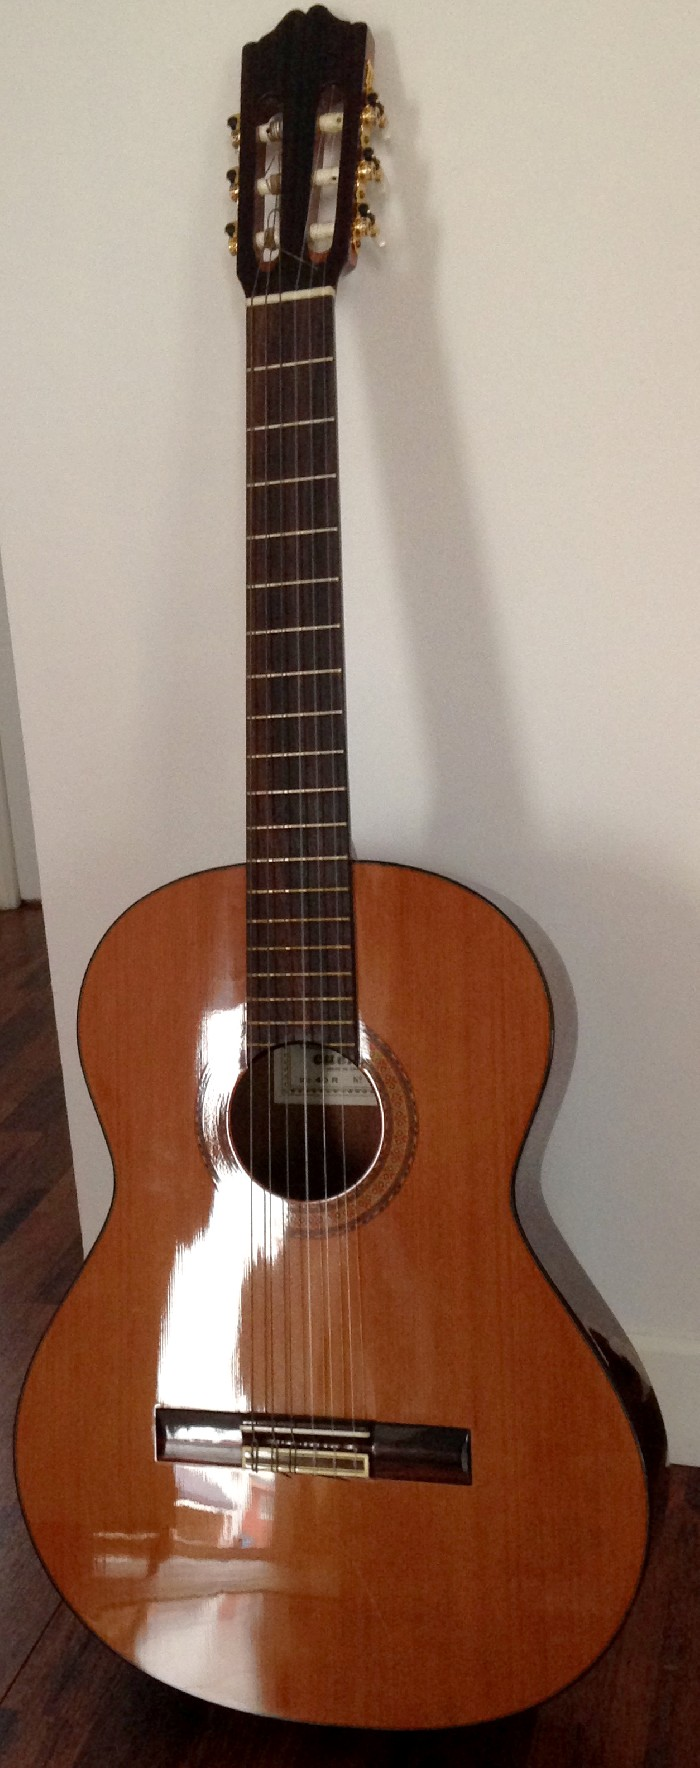 guitare classique 40r vendre. Black Bedroom Furniture Sets. Home Design Ideas